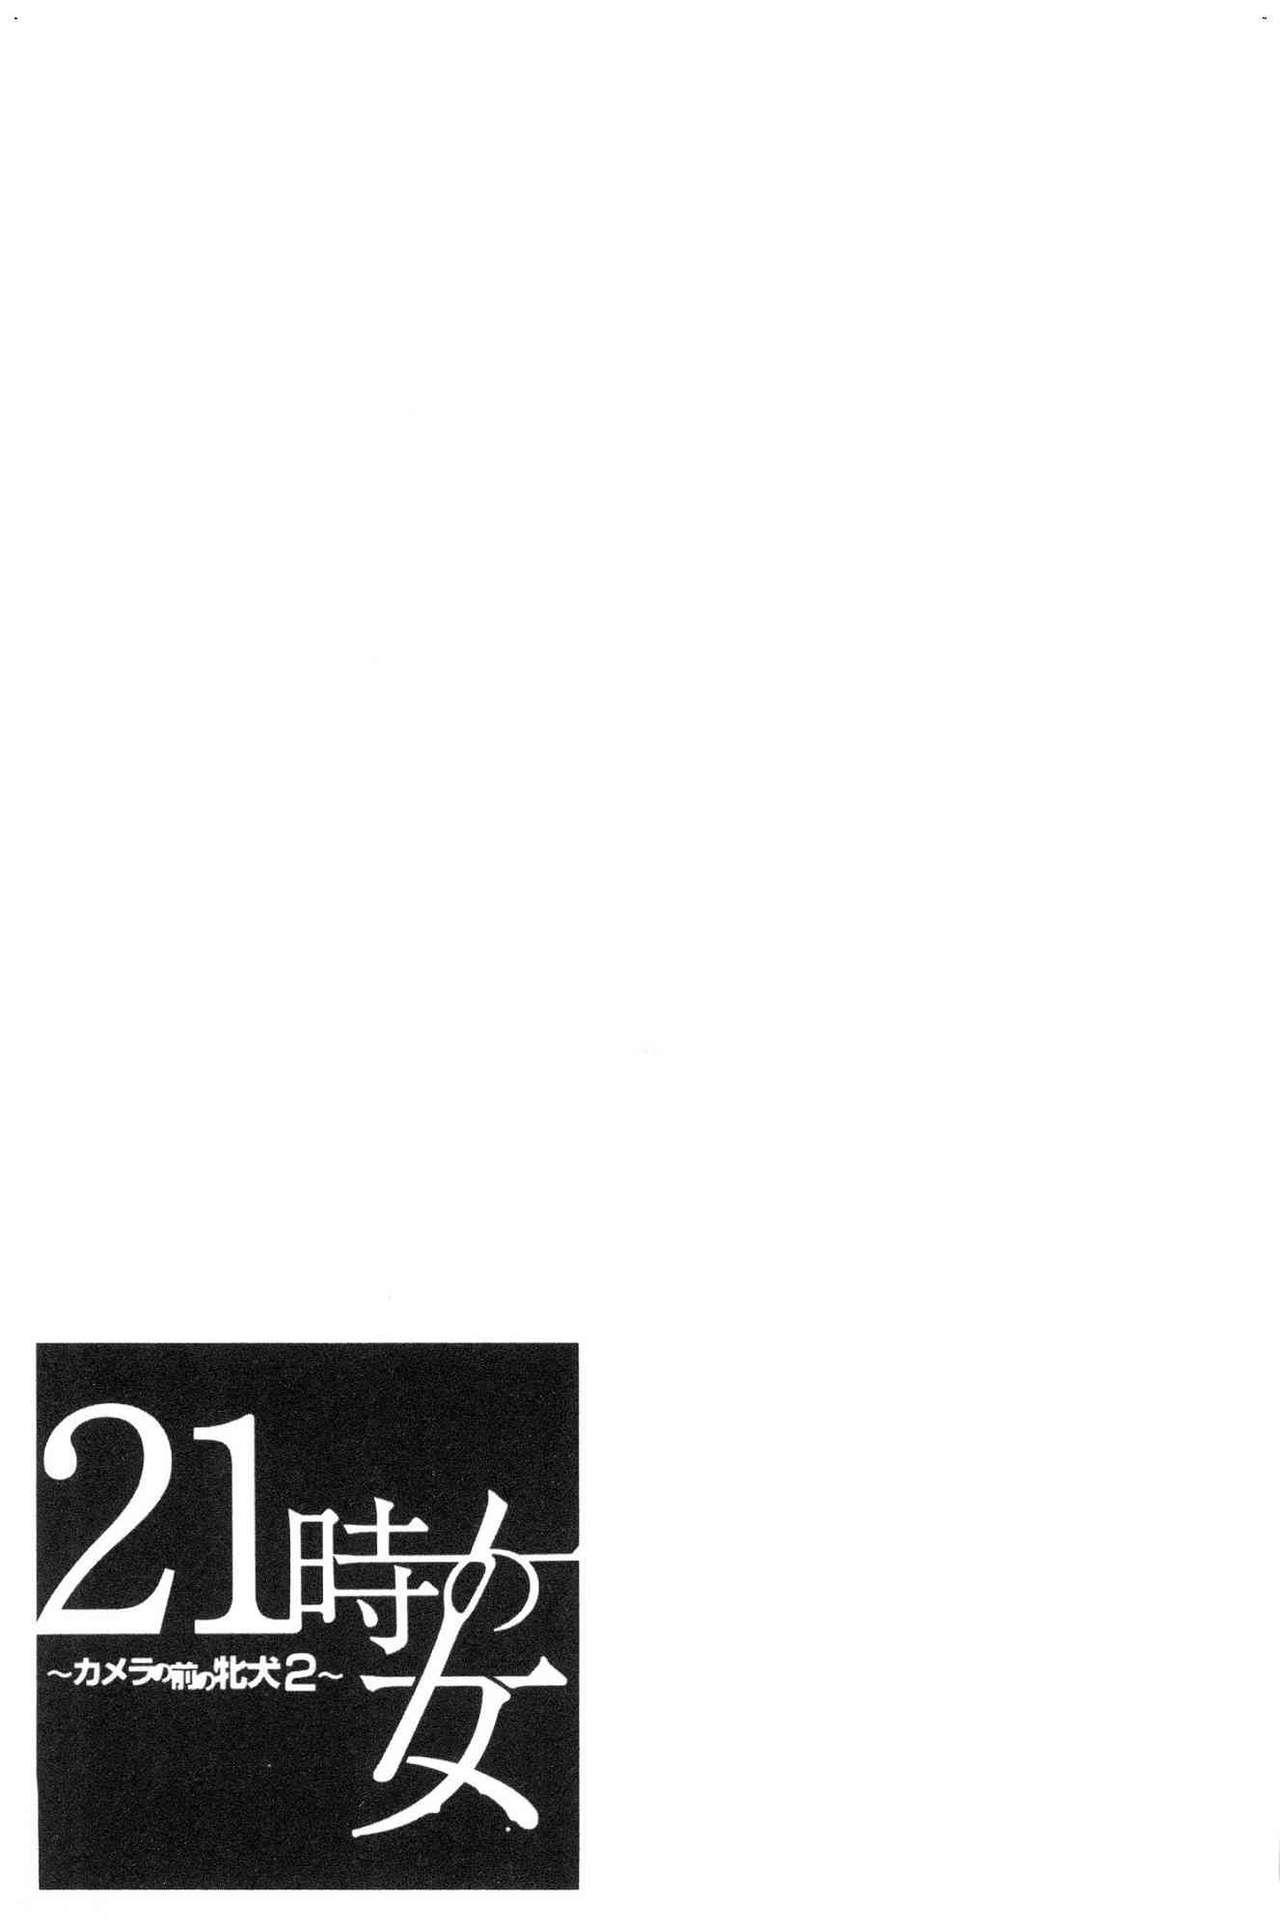 [Gotoh Akira]  21-ji no Onna ~Camera no Mae no Mesuinu~ 2 | 21時之女 ~鏡頭前的牝犬~ 2 [Chinese] 24